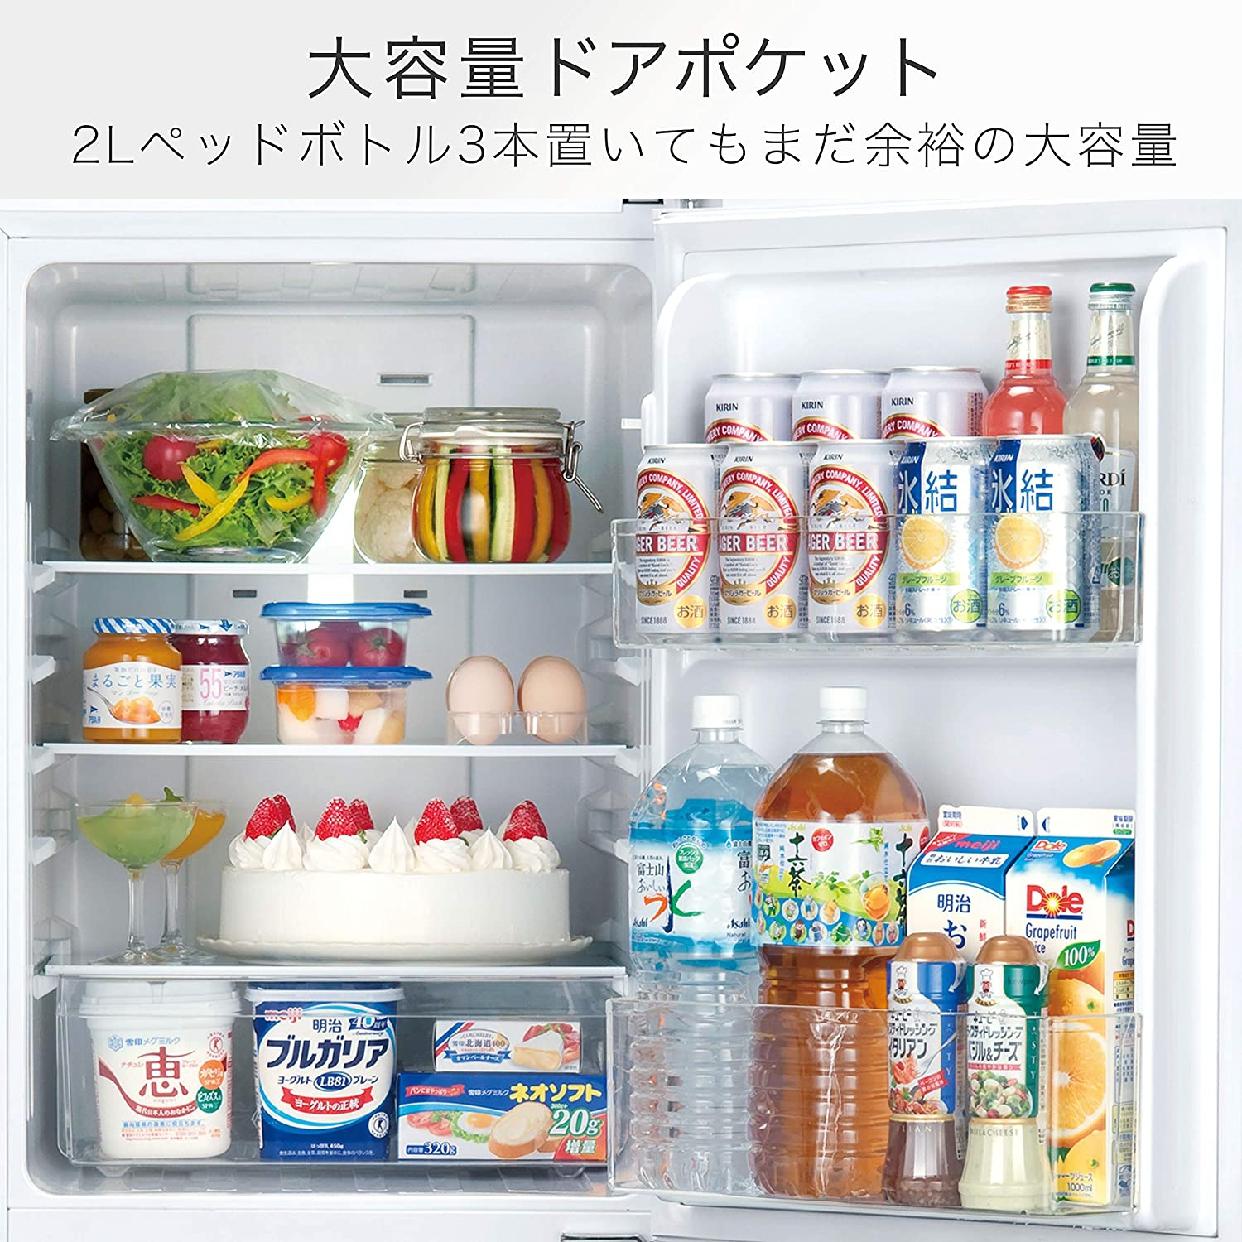 Hisense(ハイセンス)150L 冷凍冷蔵庫 HR-D15Cの商品画像2